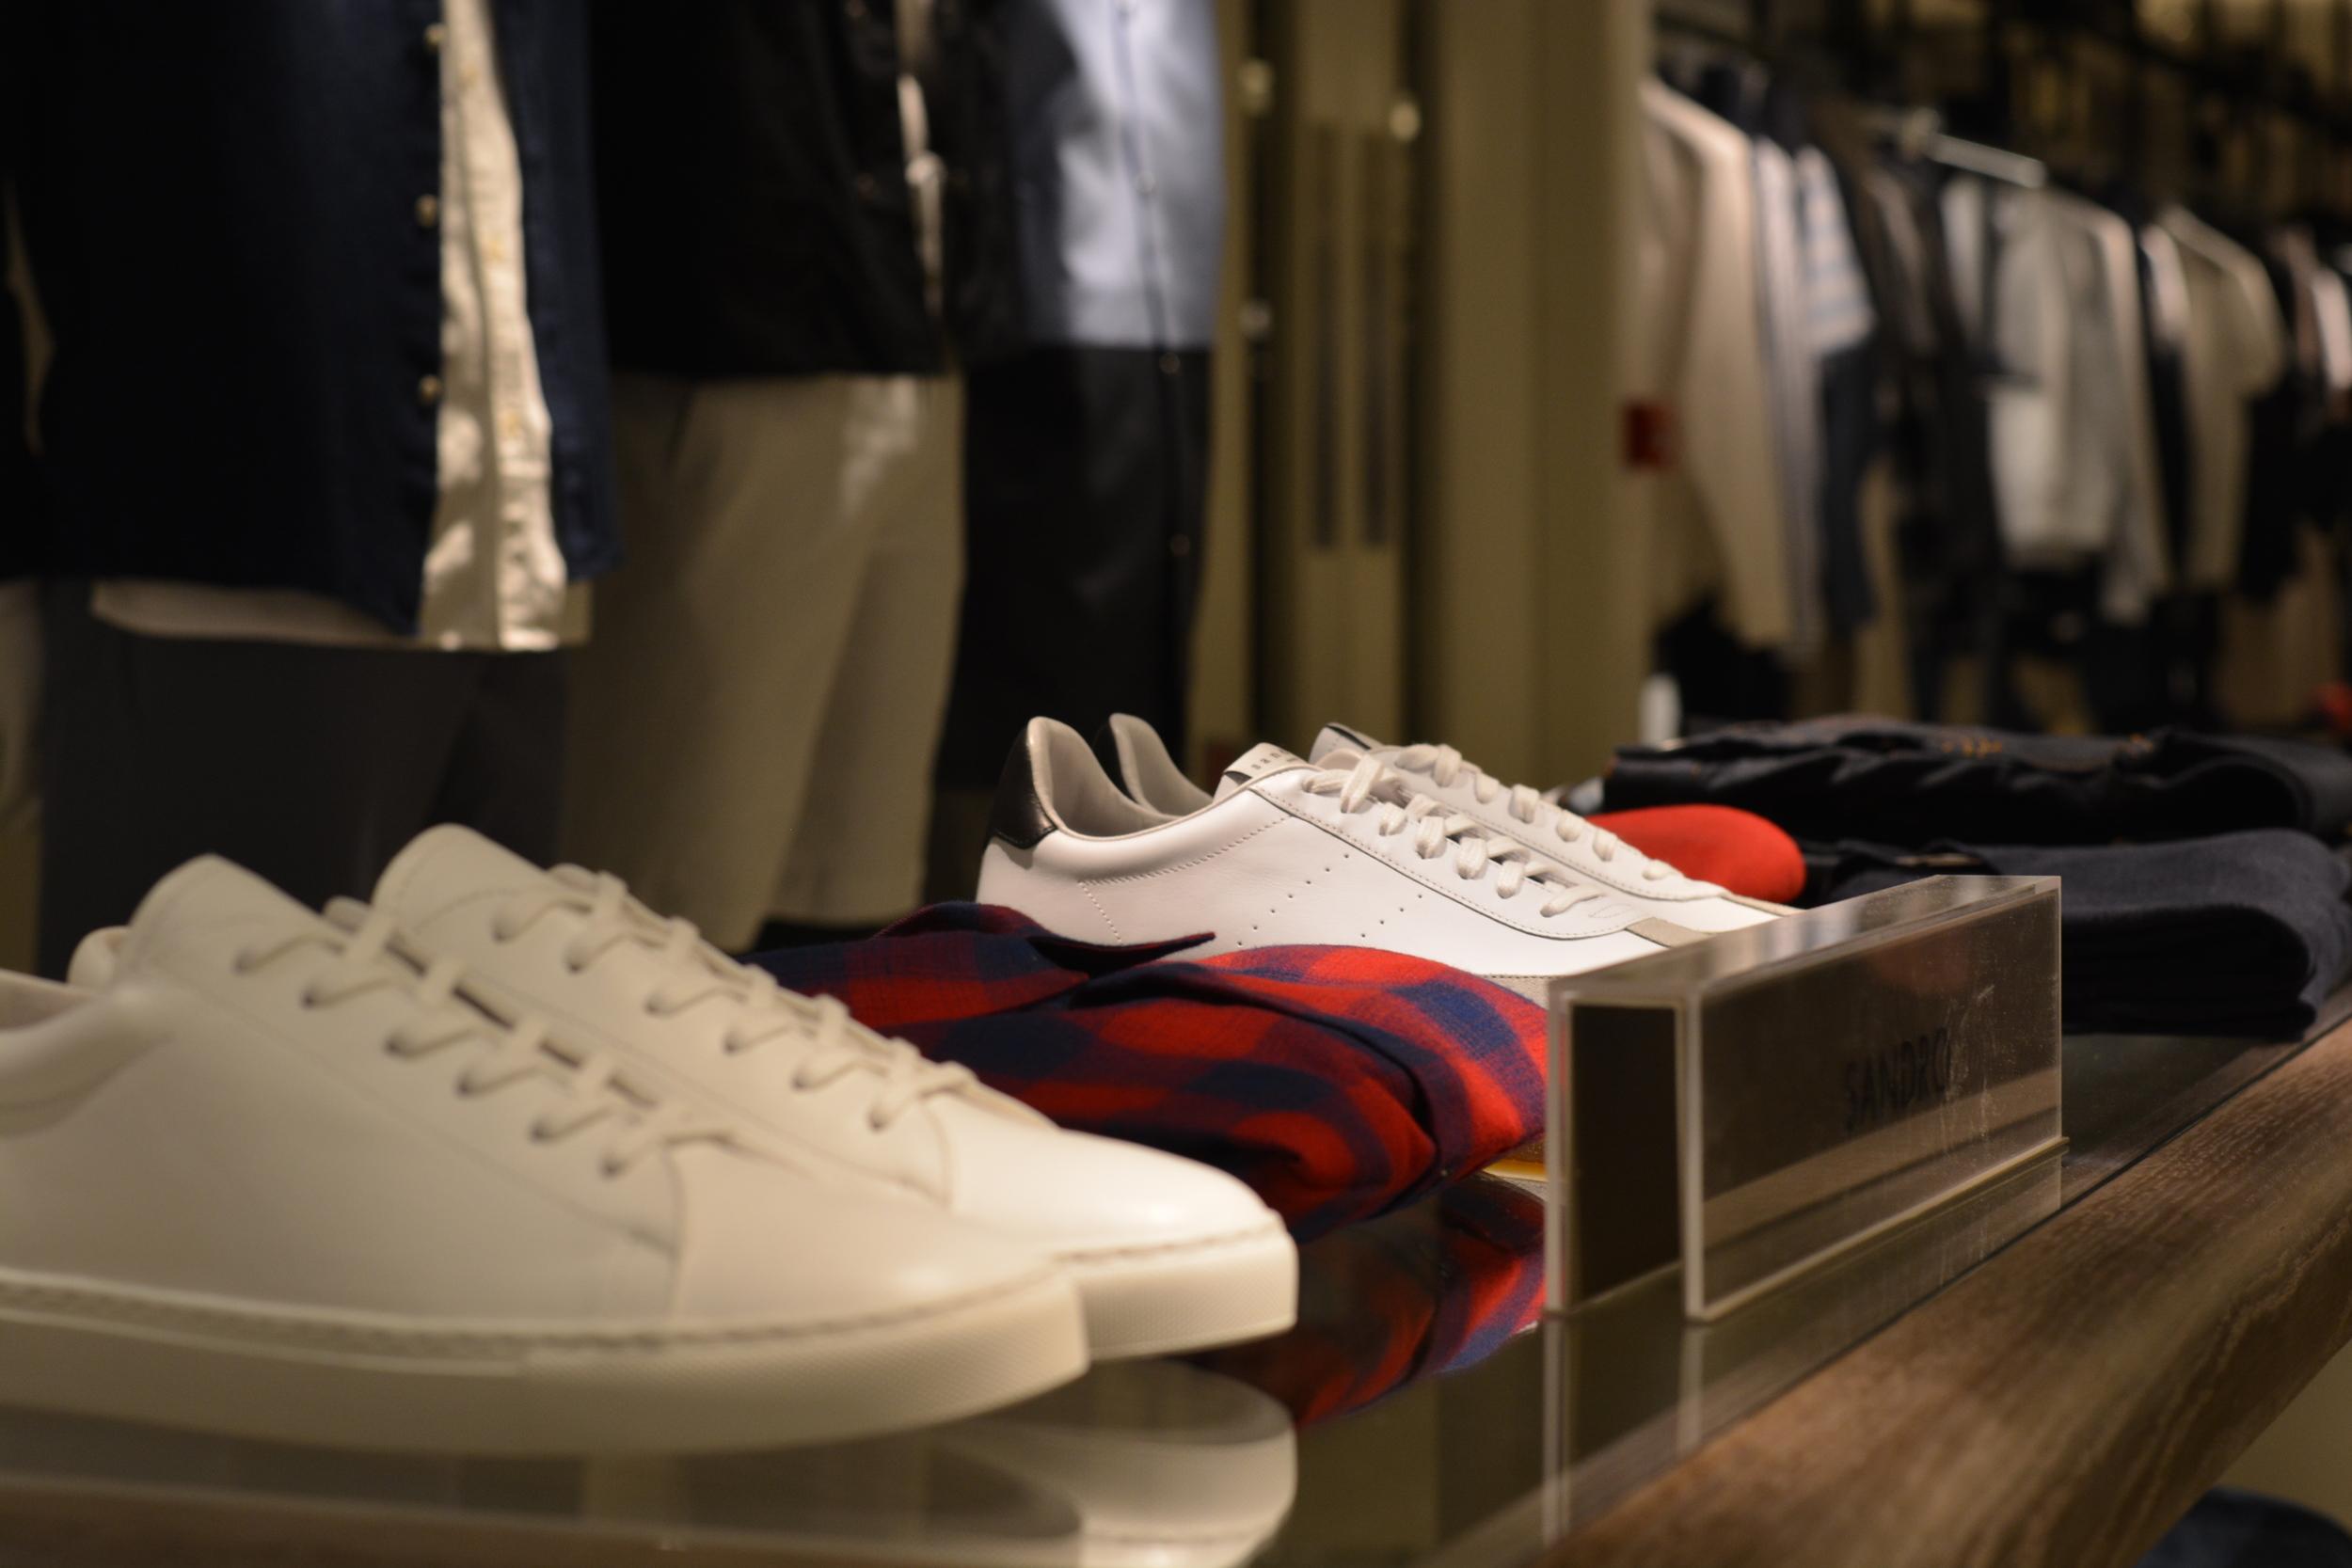 Harvey Nichols Menswear | Sam Squire UK Male fashion & lifestyle blogger